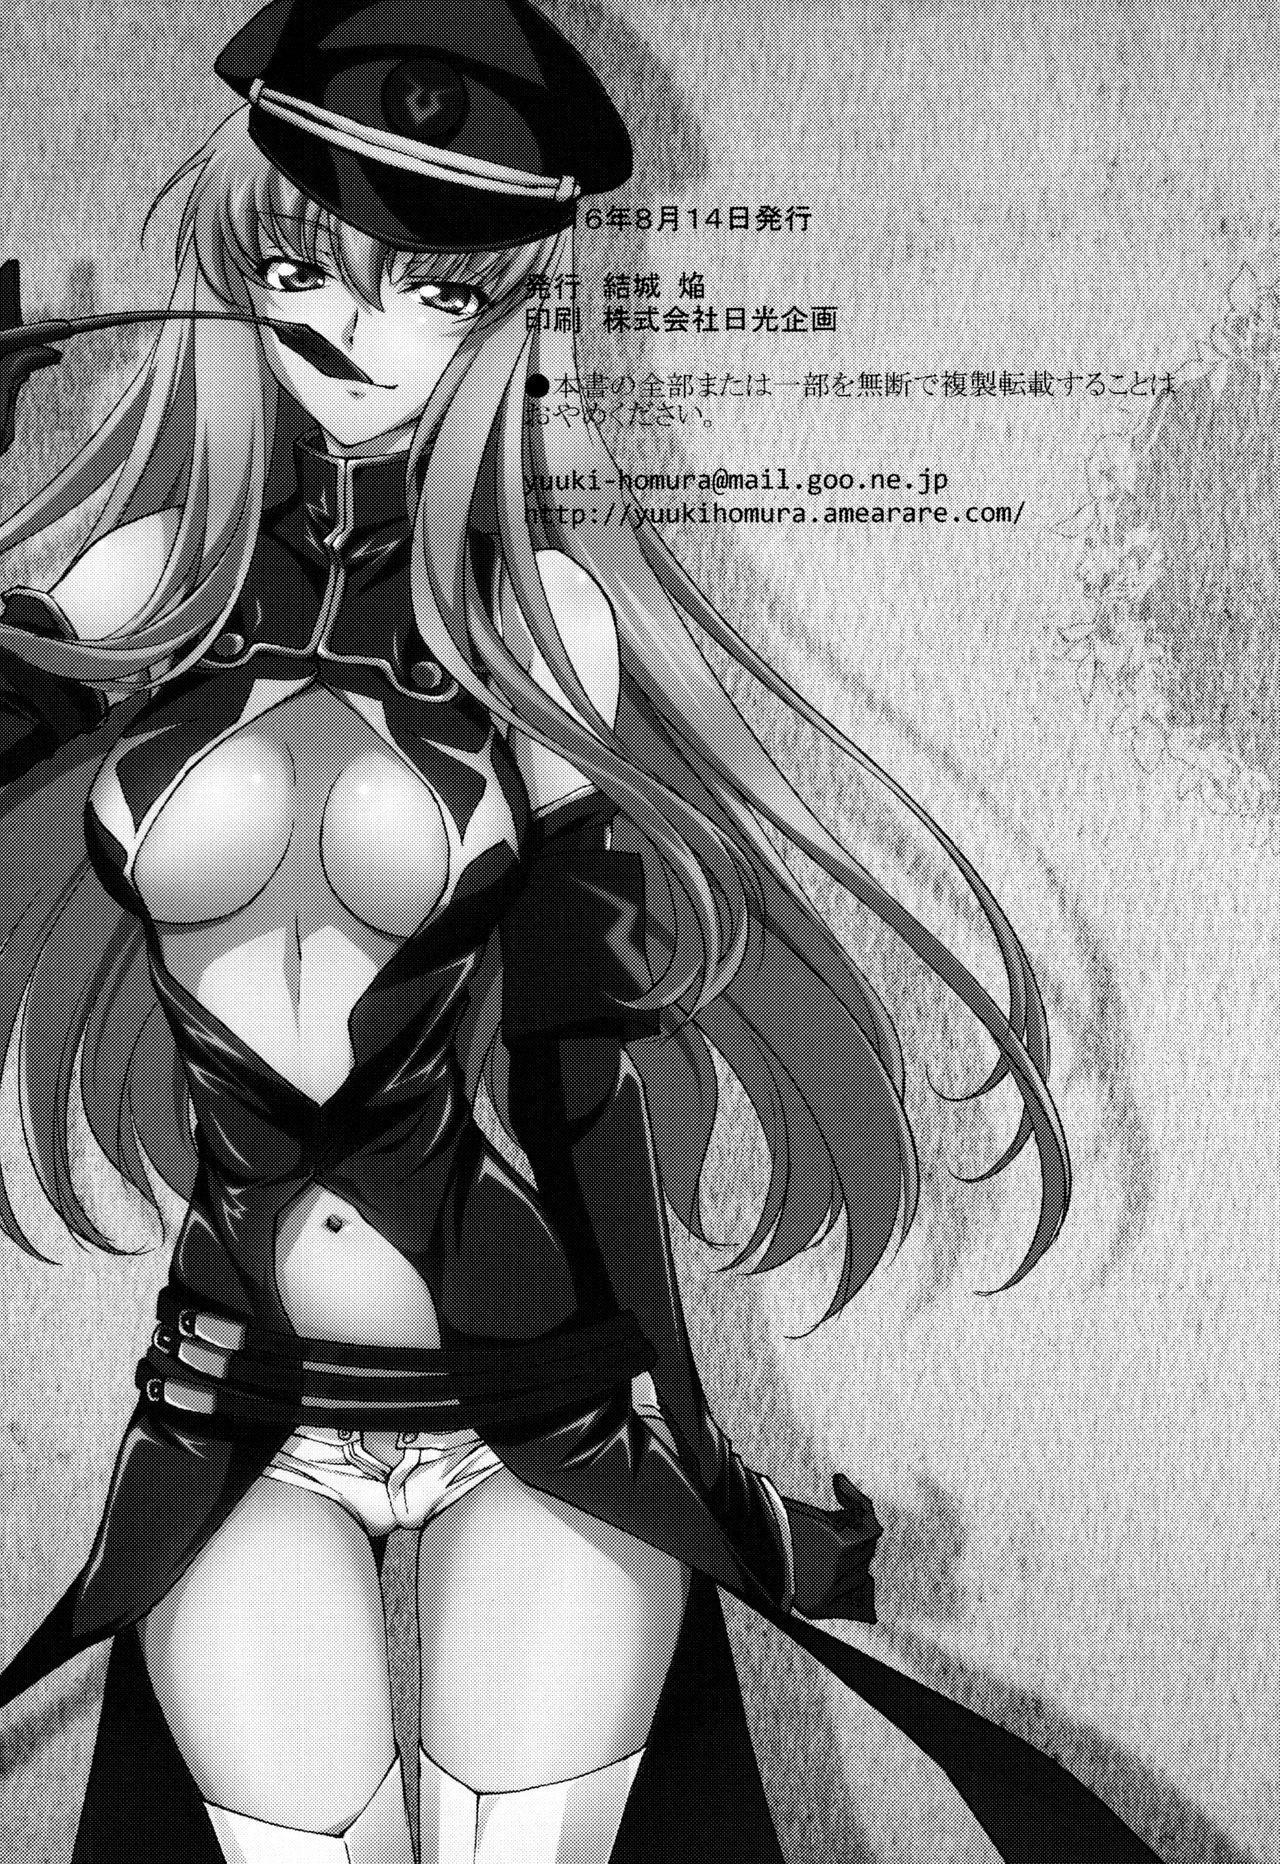 (C90) [Homura's R Comics (Yuuki Homura)] Oshioki Kallen-chan -C.C. Hen- (Code Geass) 20